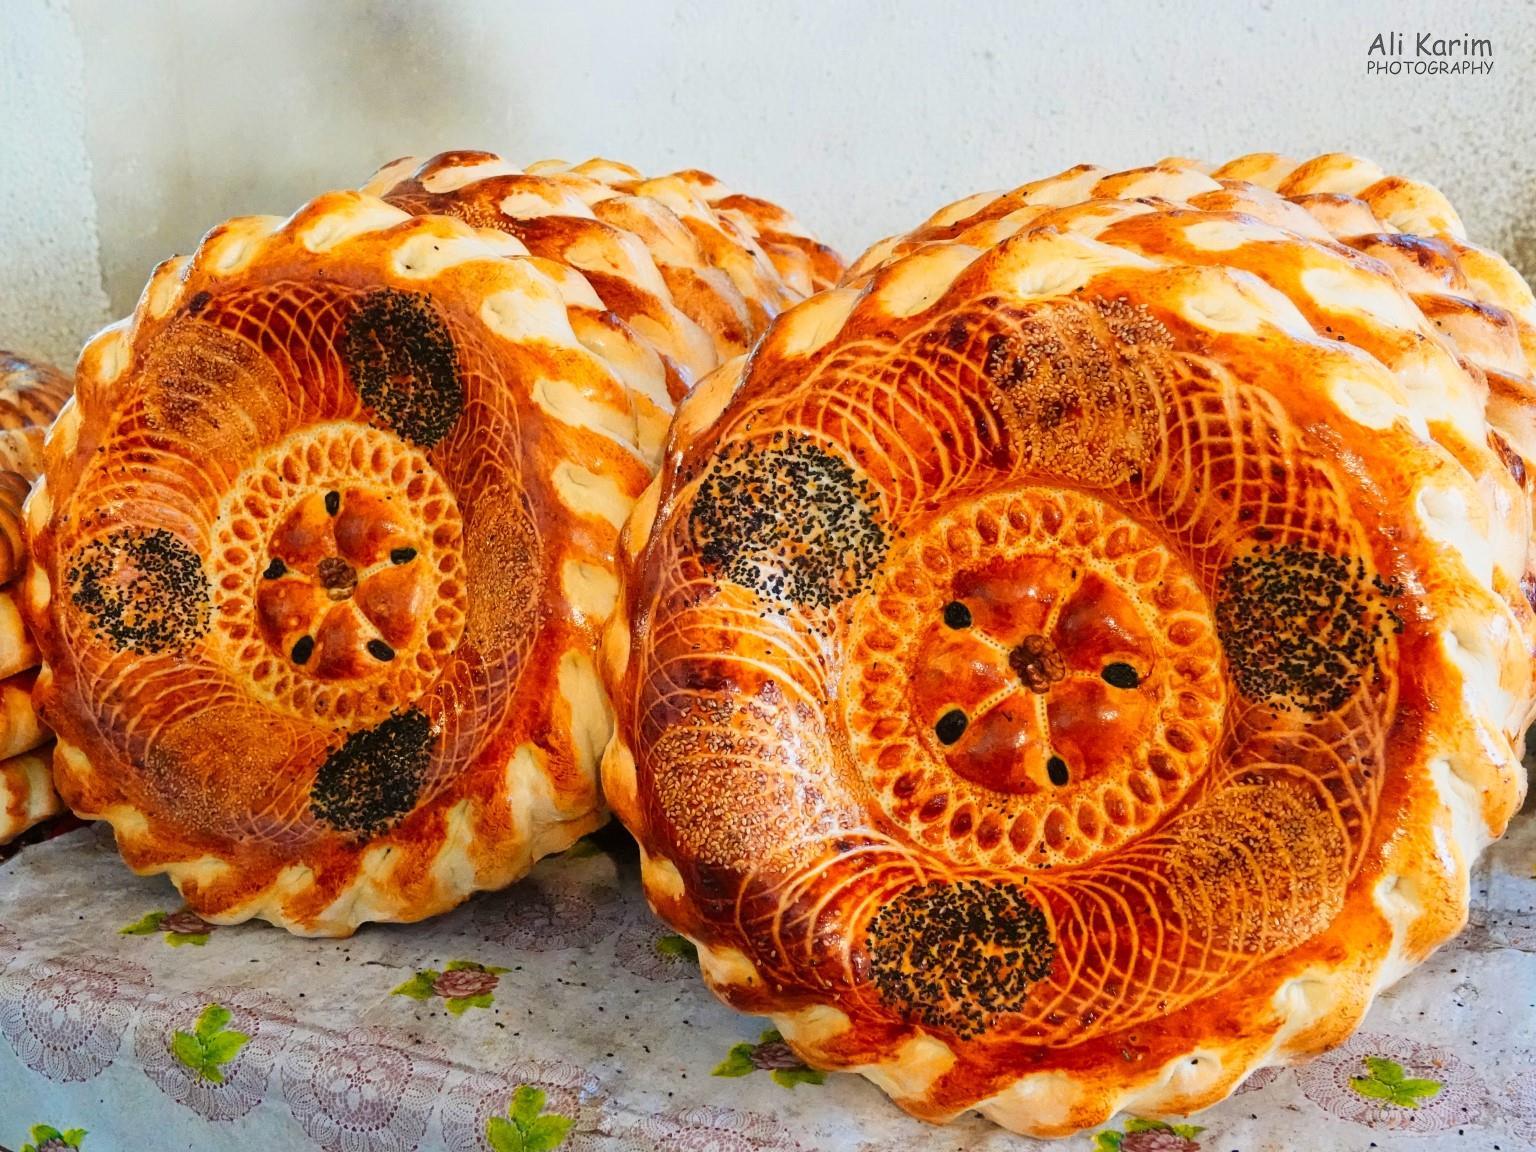 Silk Road 15: Osh, Kyrgyzstan Closer look at the artwork on the Uzbek style Lepyoshka bread